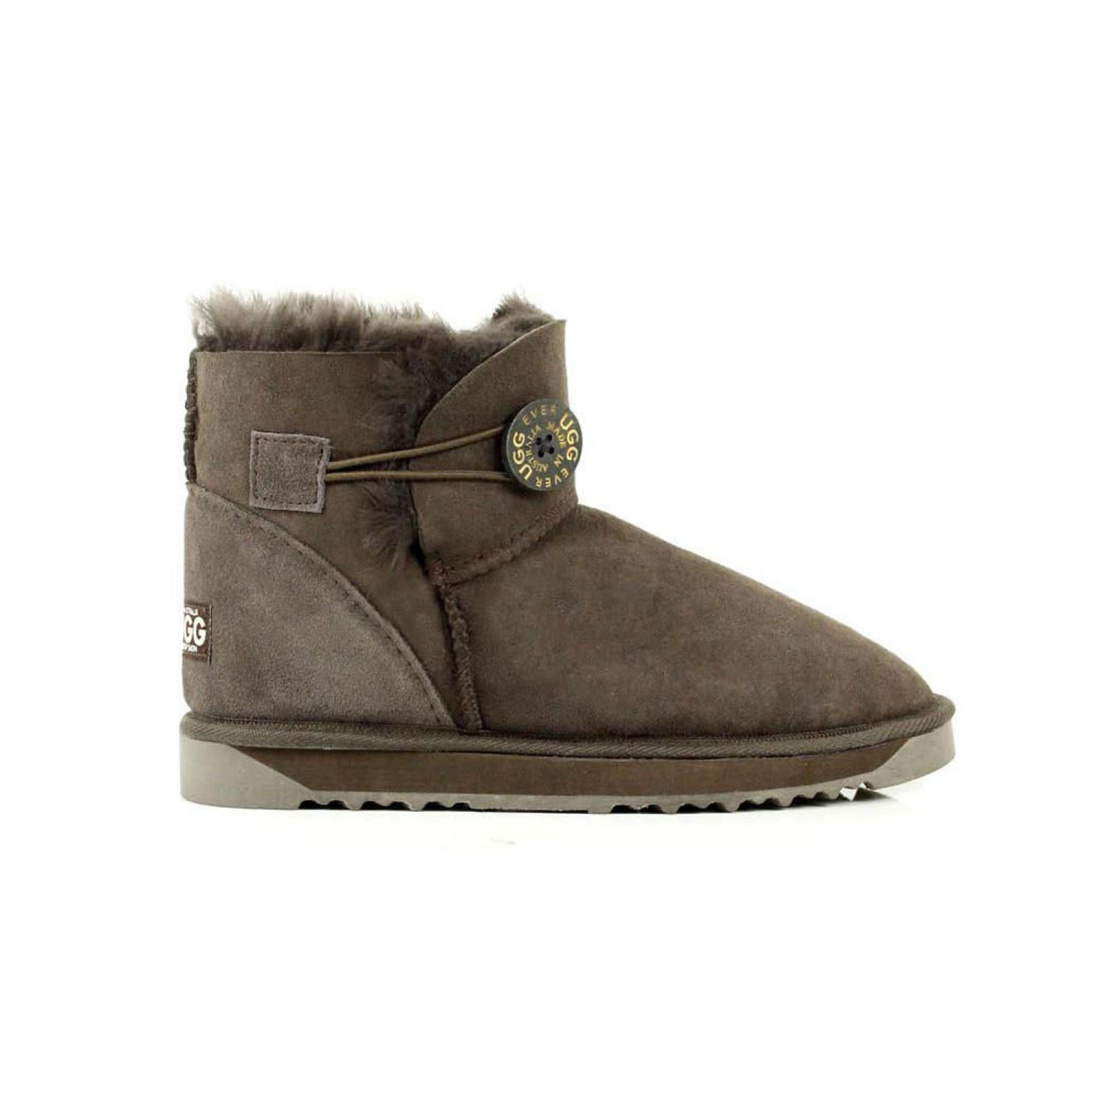 UGG Button Ankle Boots Mini - Chocolate - AU Women 8 / Men 6